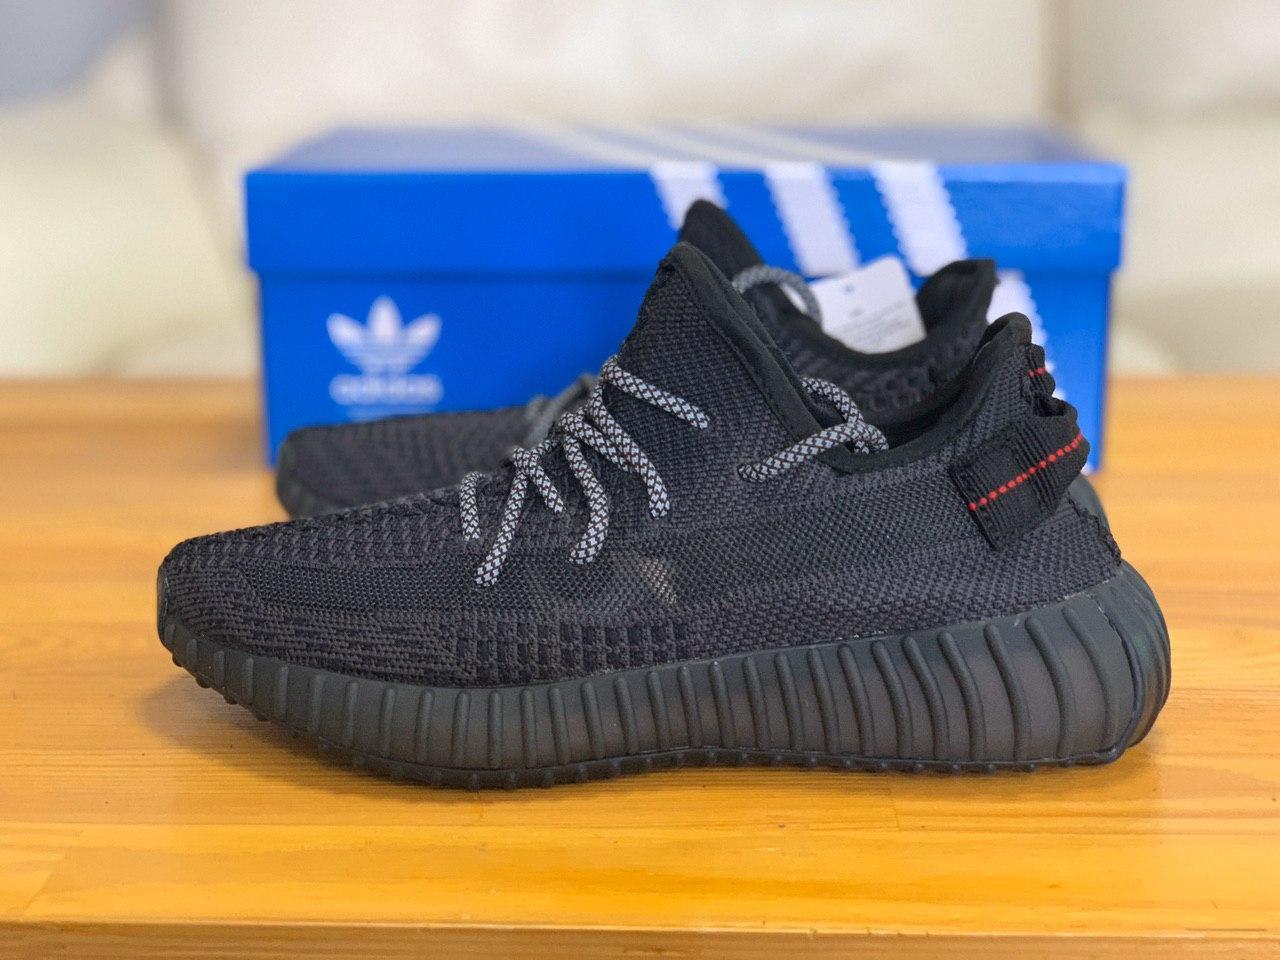 Кросівки Adidas Yeezy Boost 350 V2 Адідас Ізі Буст В2 ⏩ (37,40)